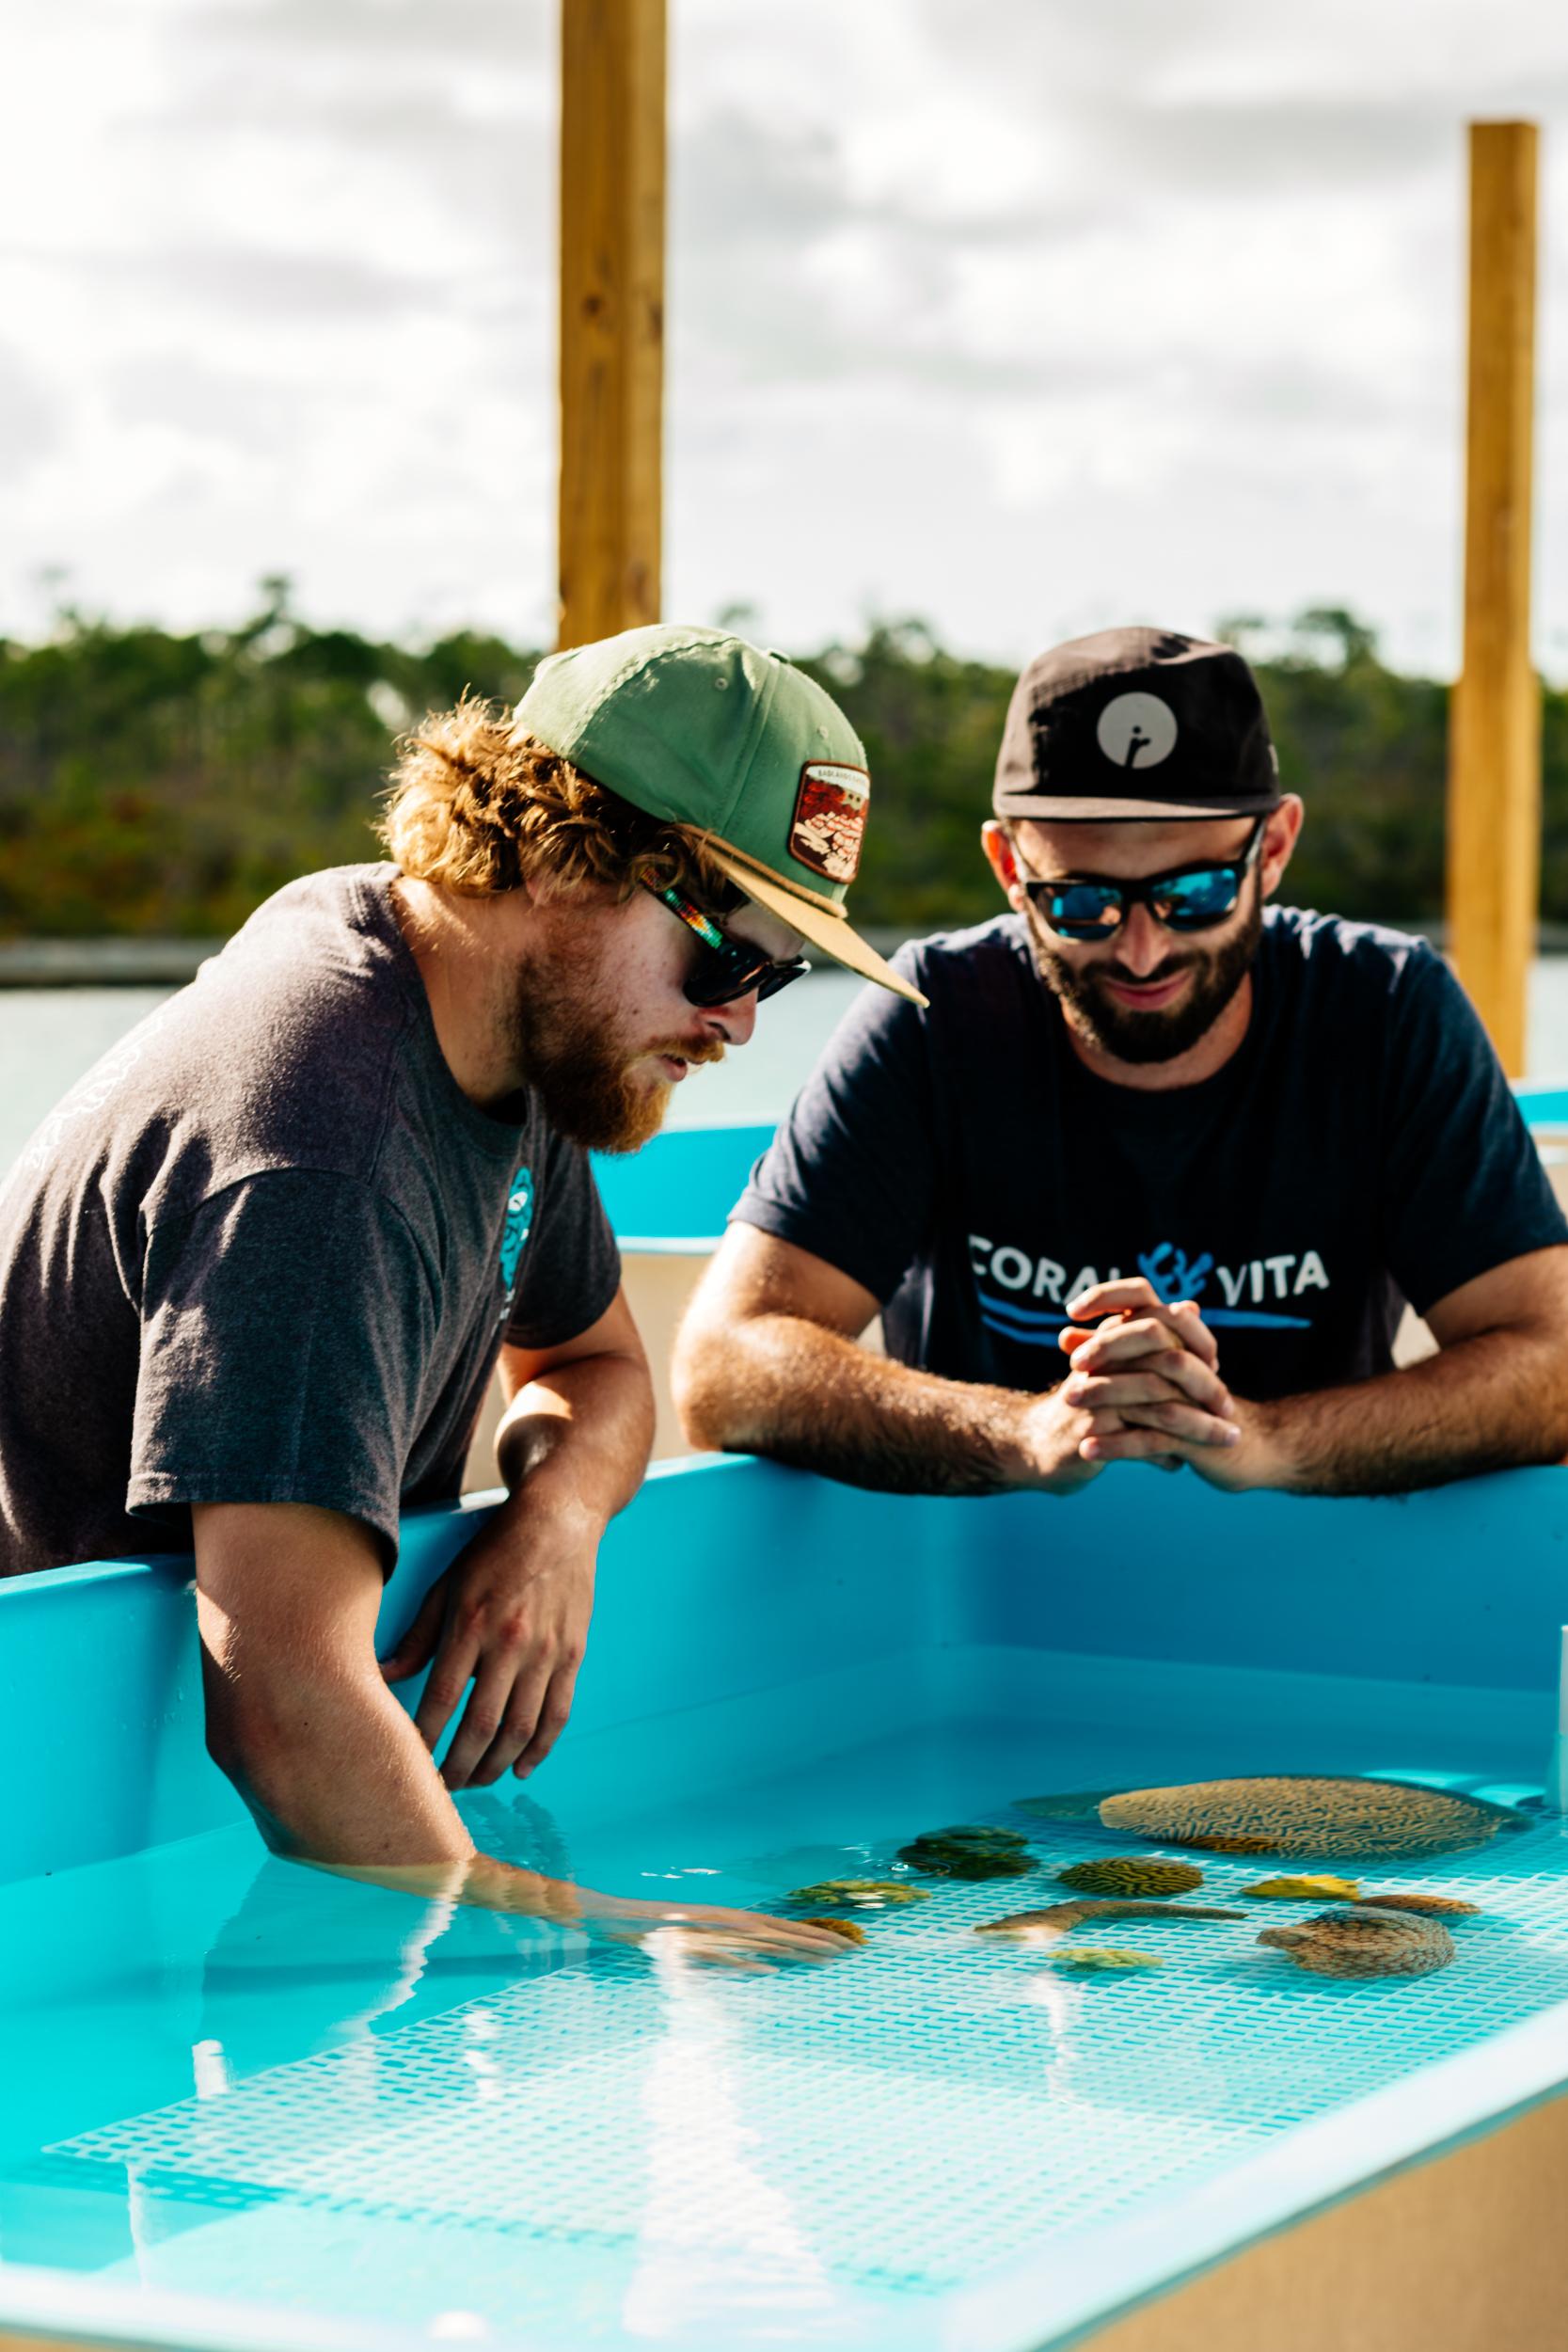 Coral Vita's founders Gator Halpern and Sam Teicher.